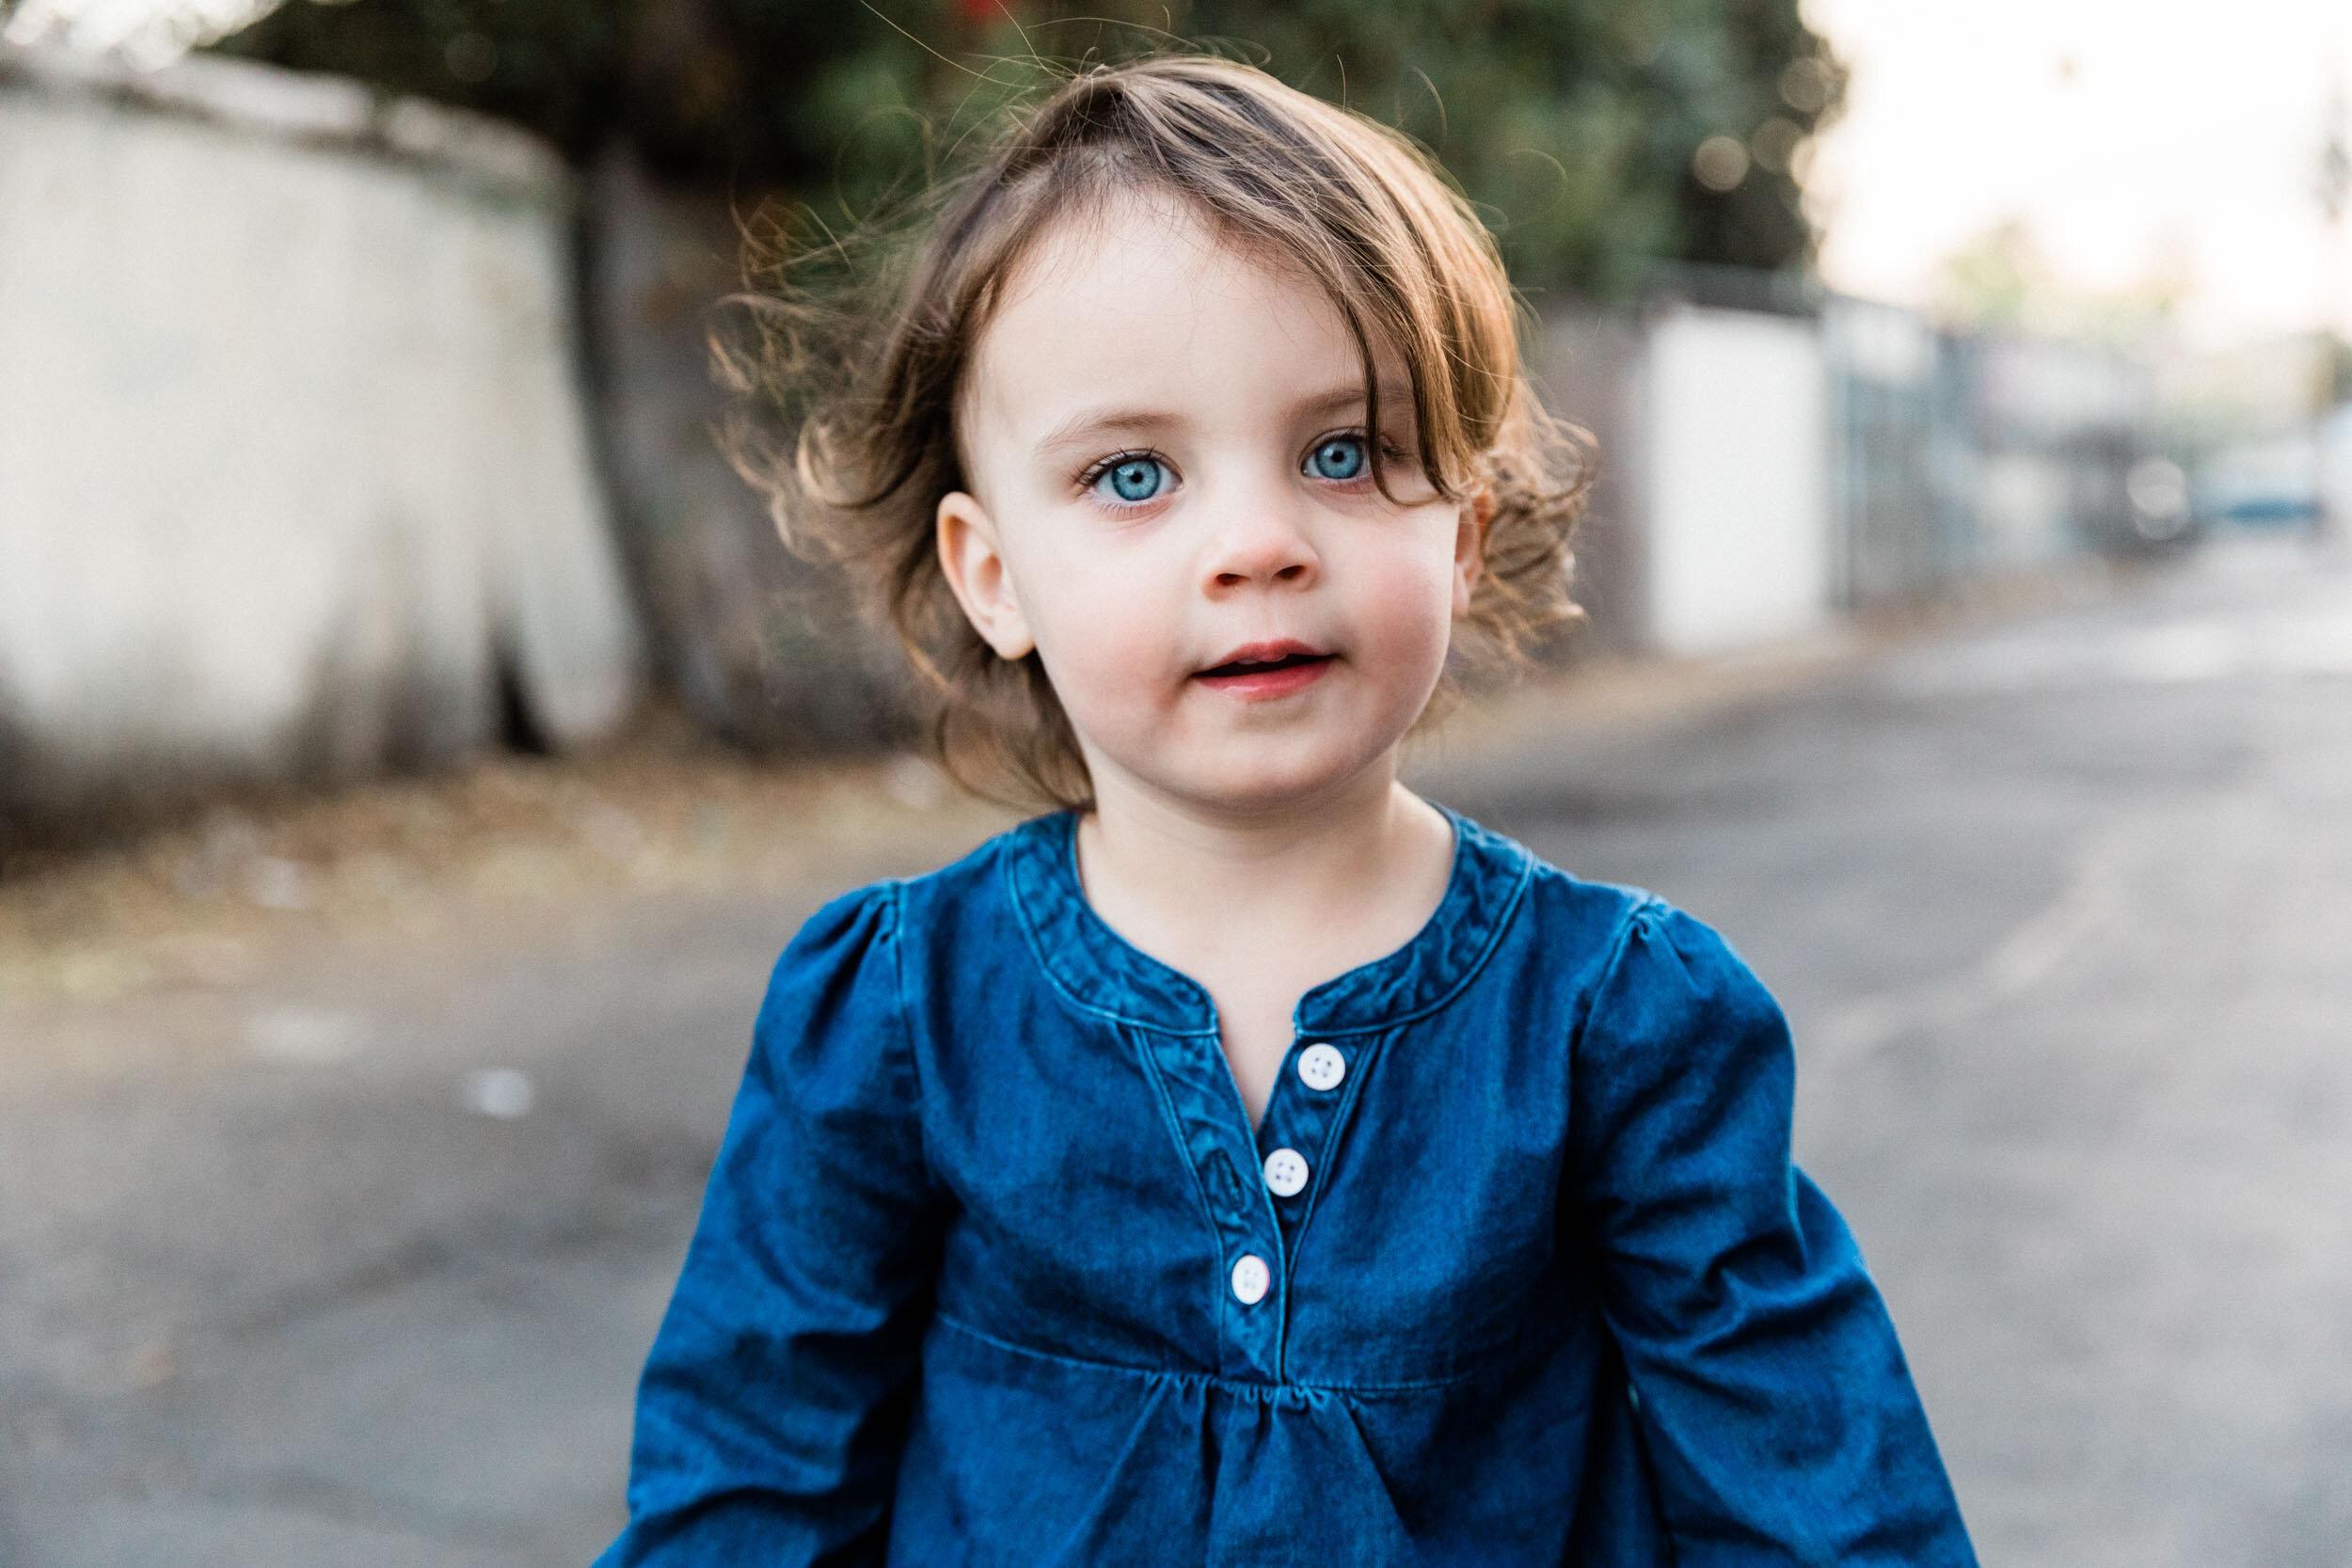 BKM-Photography-Highland-Park-Los-Angeles-Family-Photographer-NELA-Eagle-Rock-Silver-Lake-Glendale-Photographer-0010.jpg